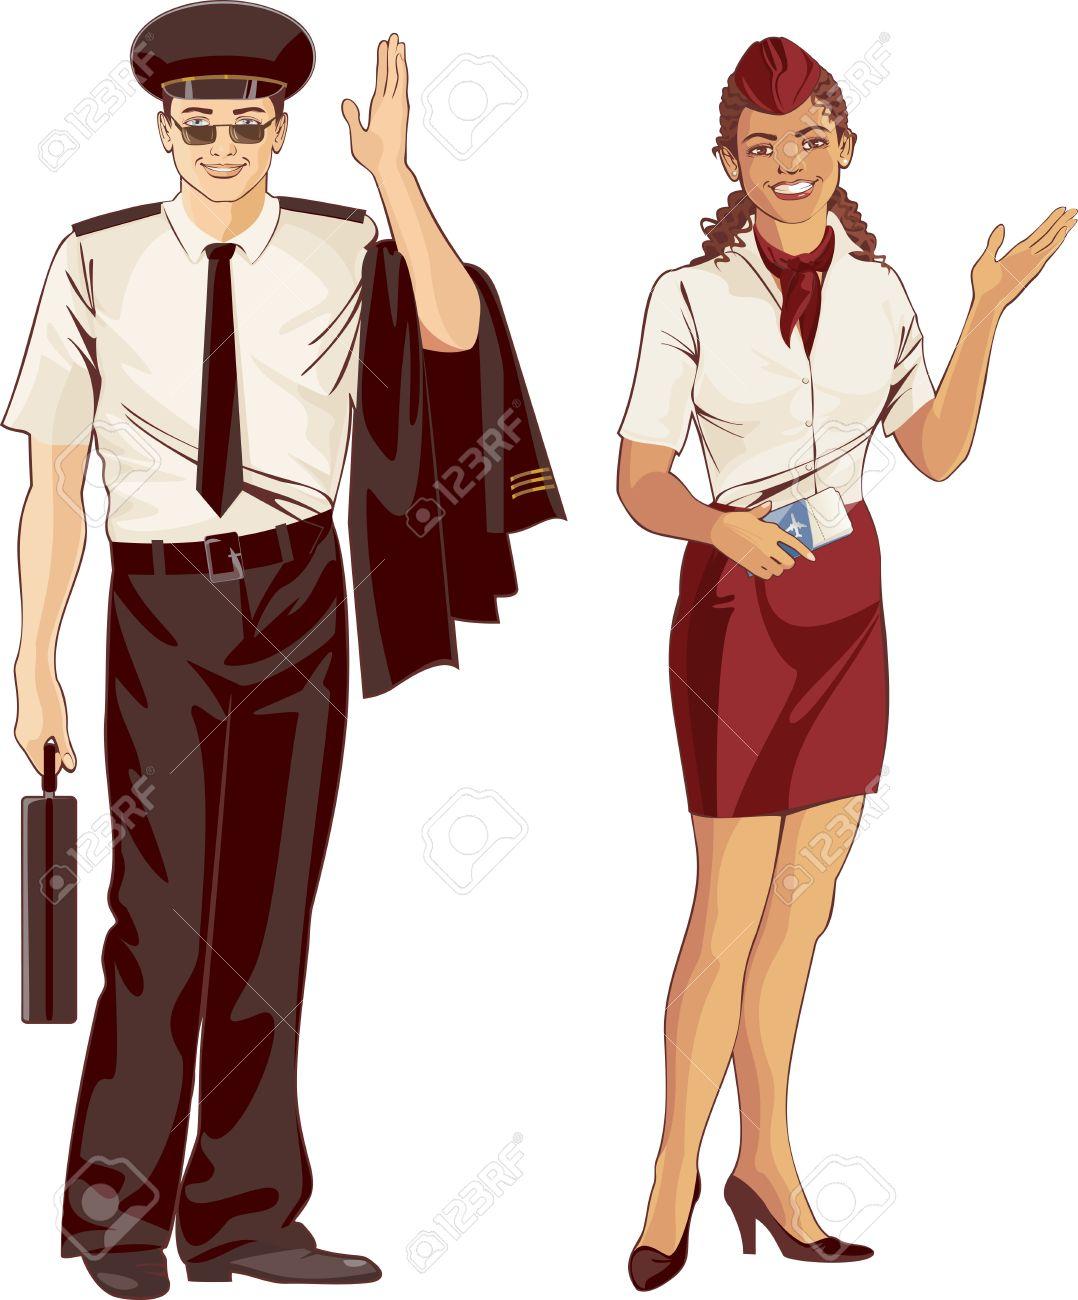 Male flight attendant clipart.